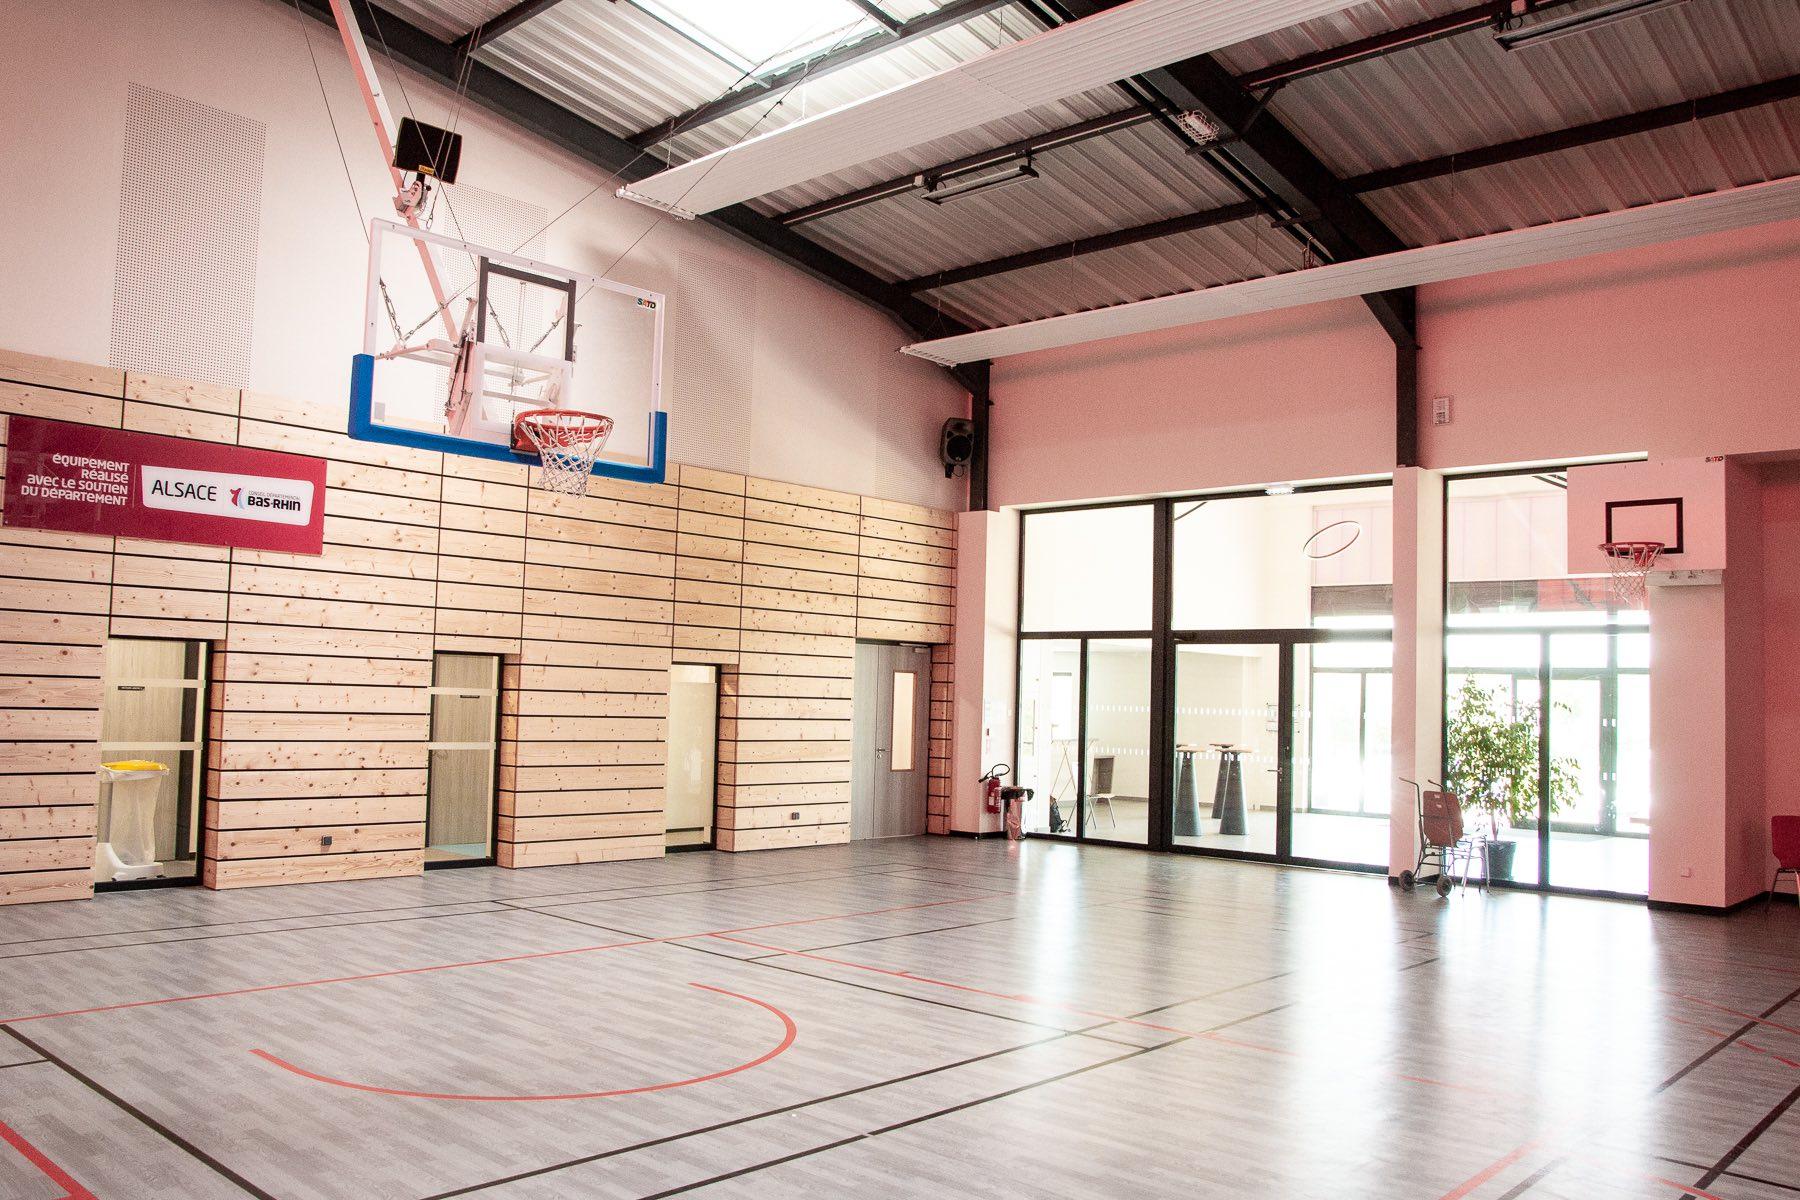 Salle Culturelle Et Sportive De Morschwiller Menuiserie Schalck